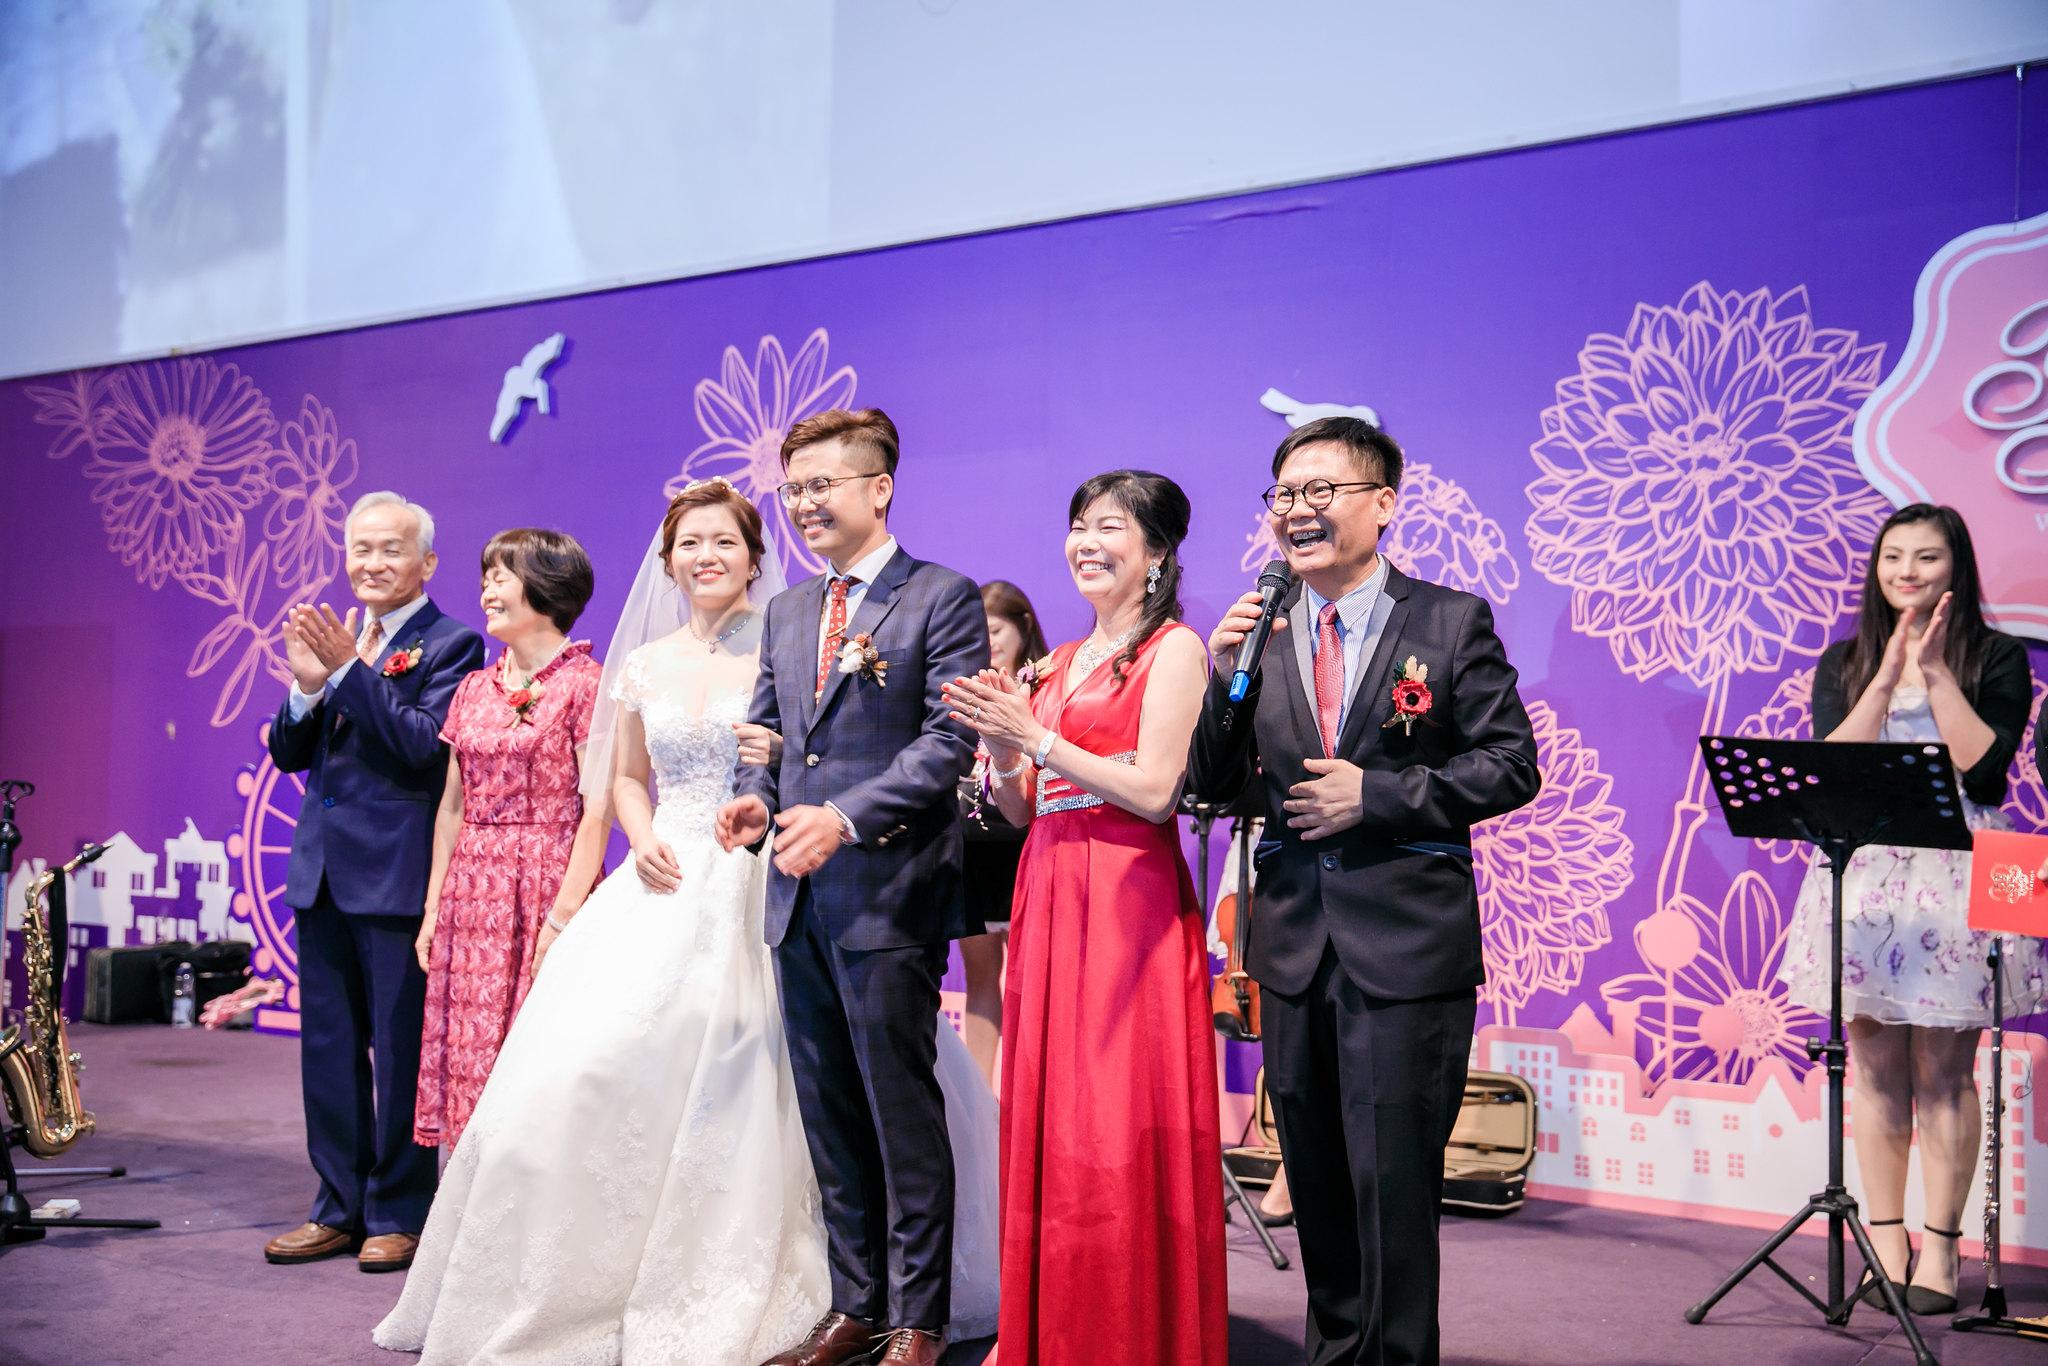 wedding-373